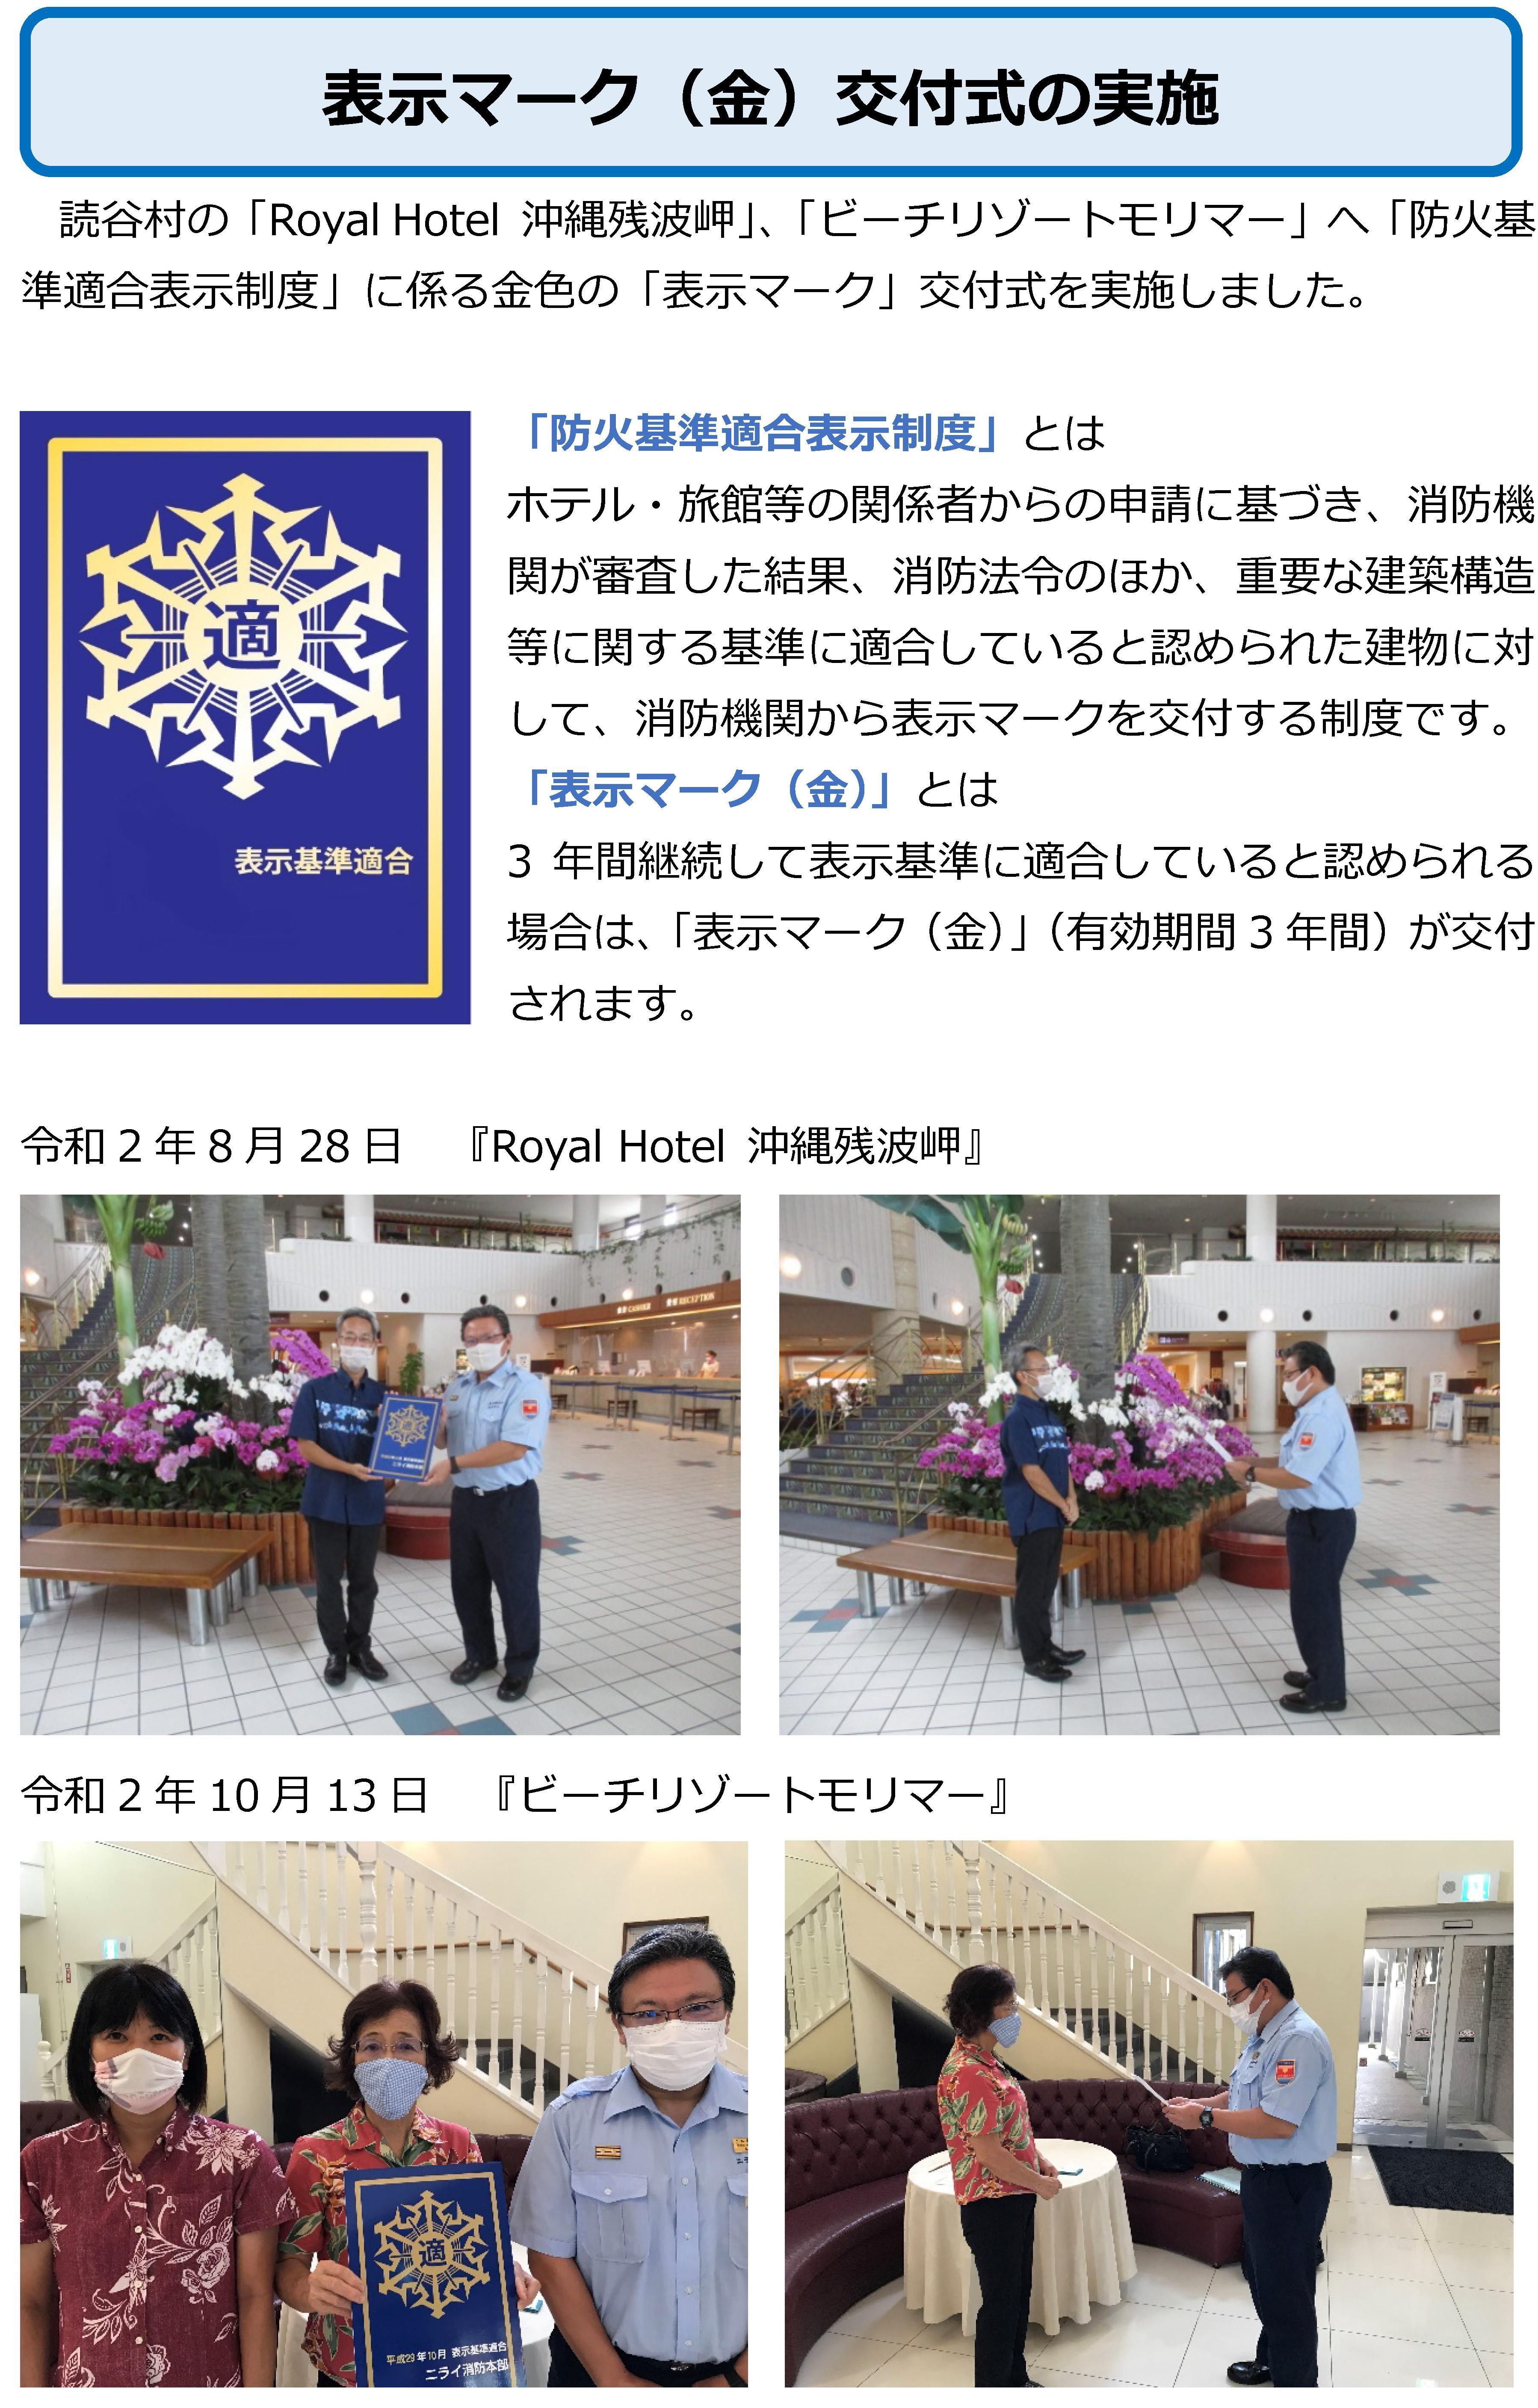 02-表示マーク(金)交付式に係る広報文(広報誌掲載内容).jpg